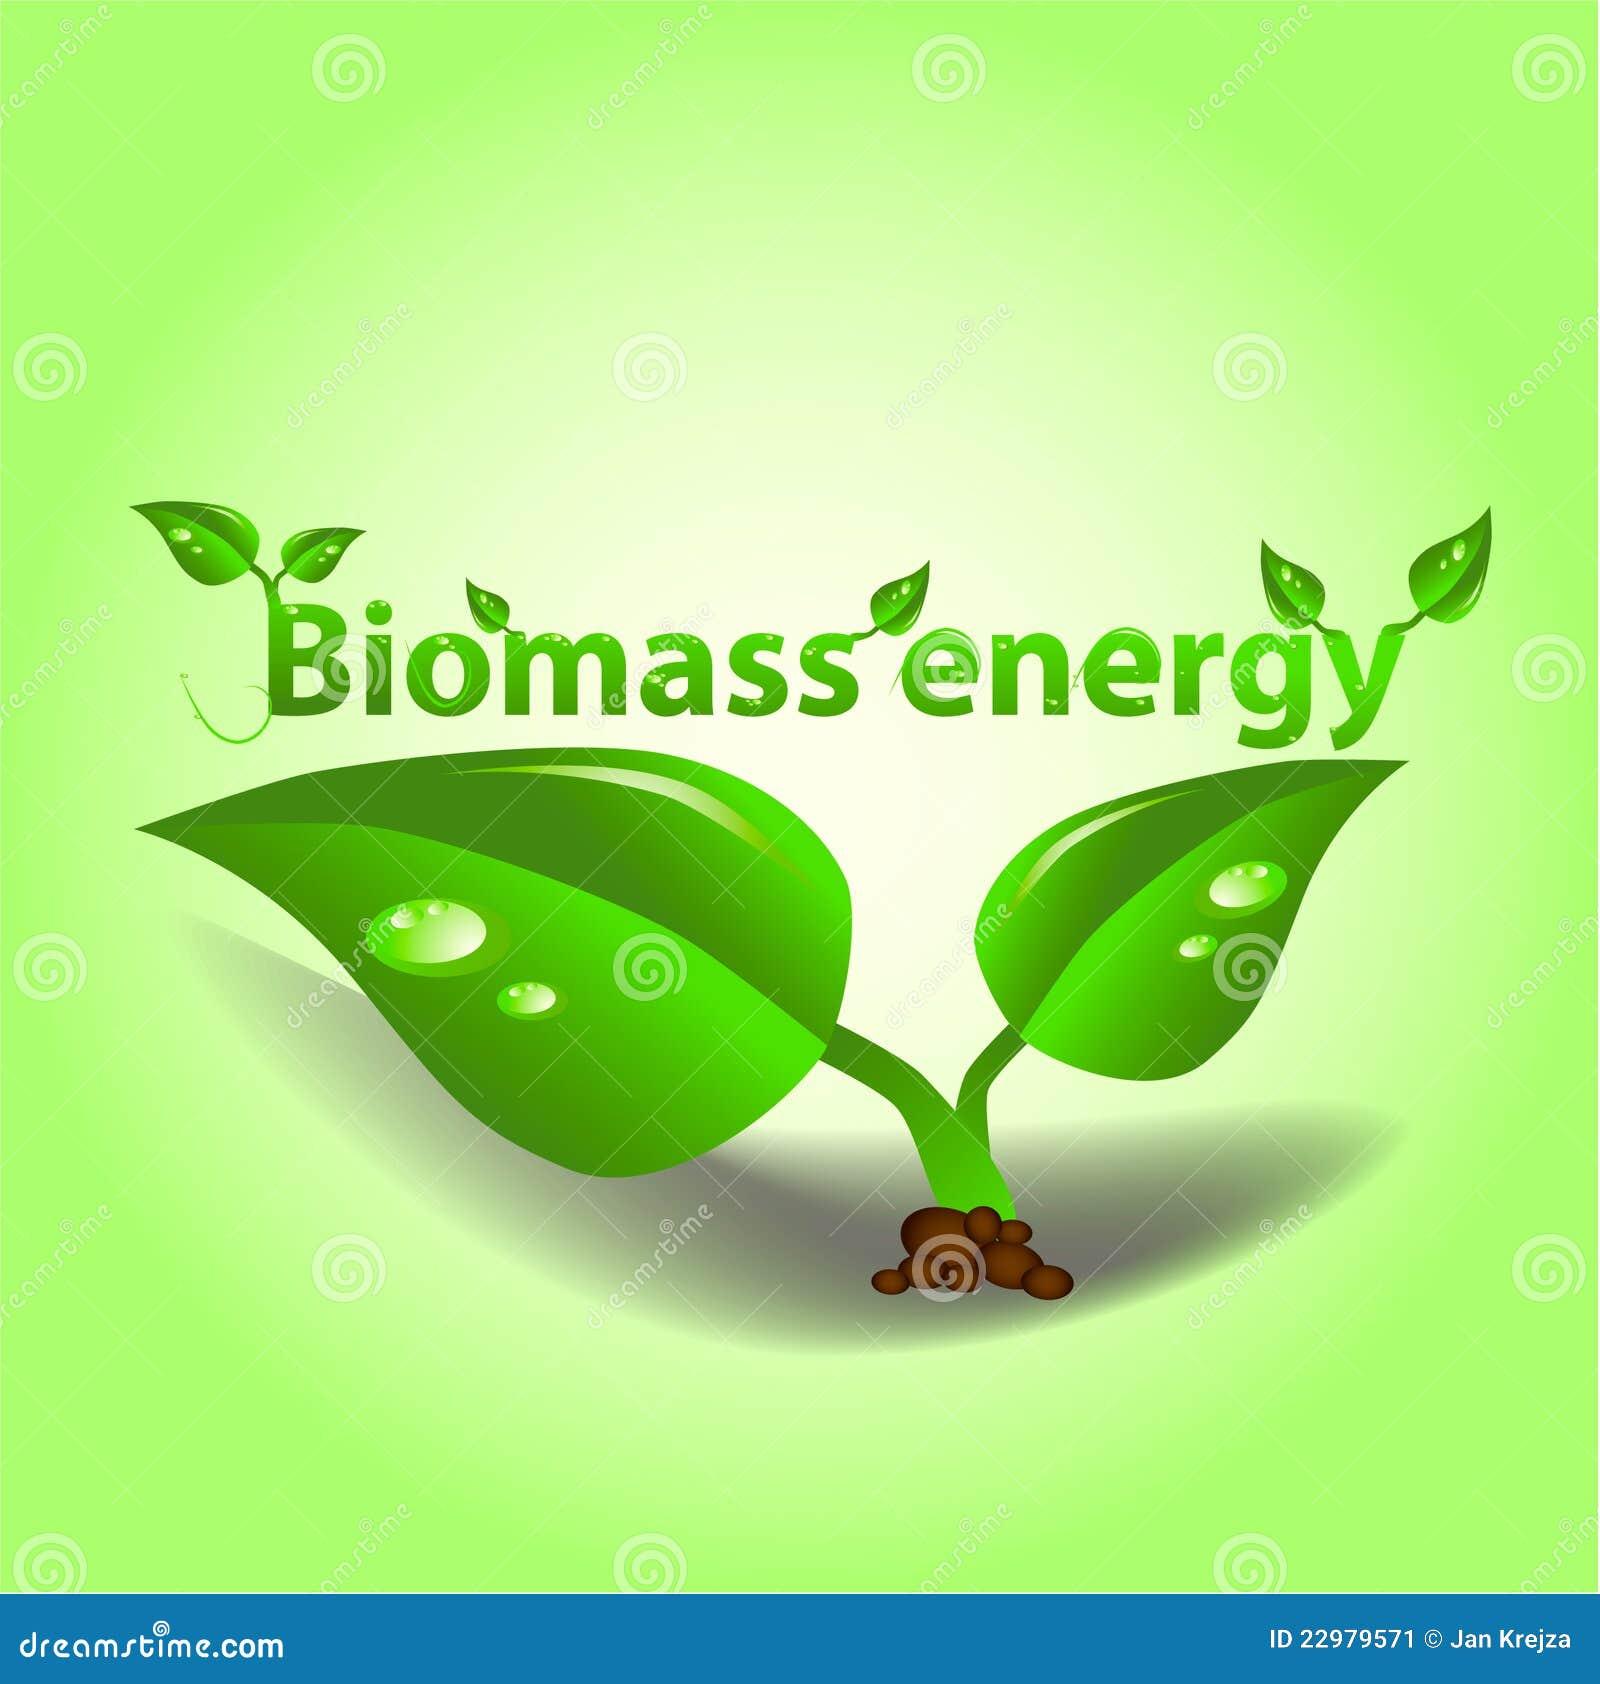 biomass energy stock vector illustration of green material 22979571. Black Bedroom Furniture Sets. Home Design Ideas